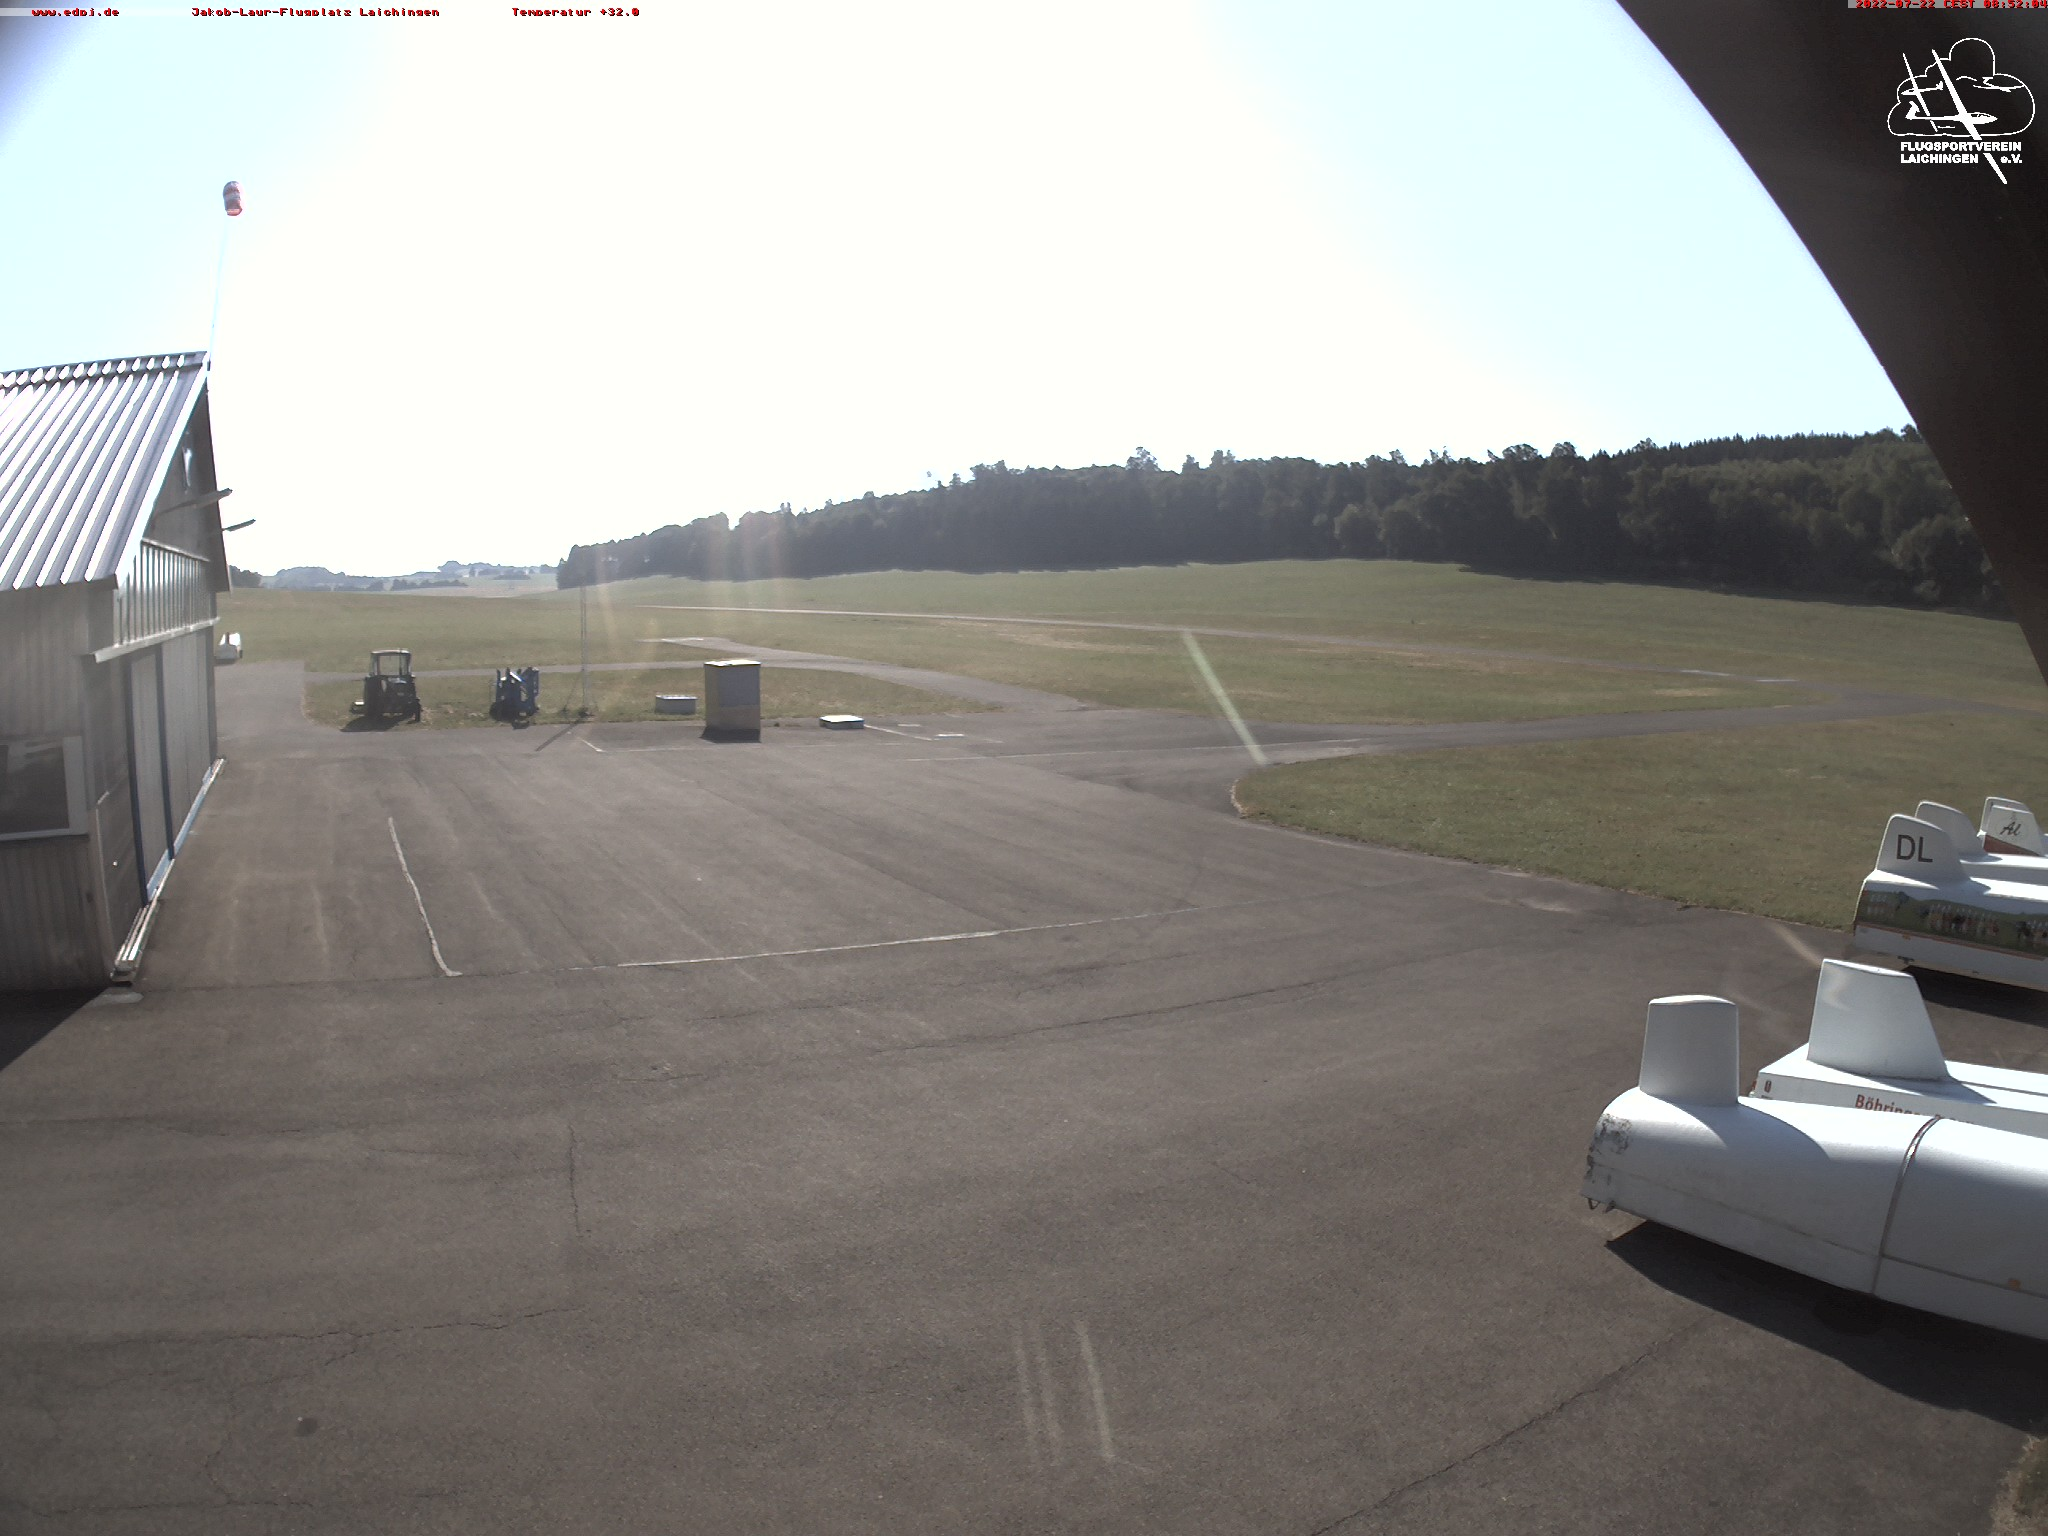 Laichingen Sun. 08:56